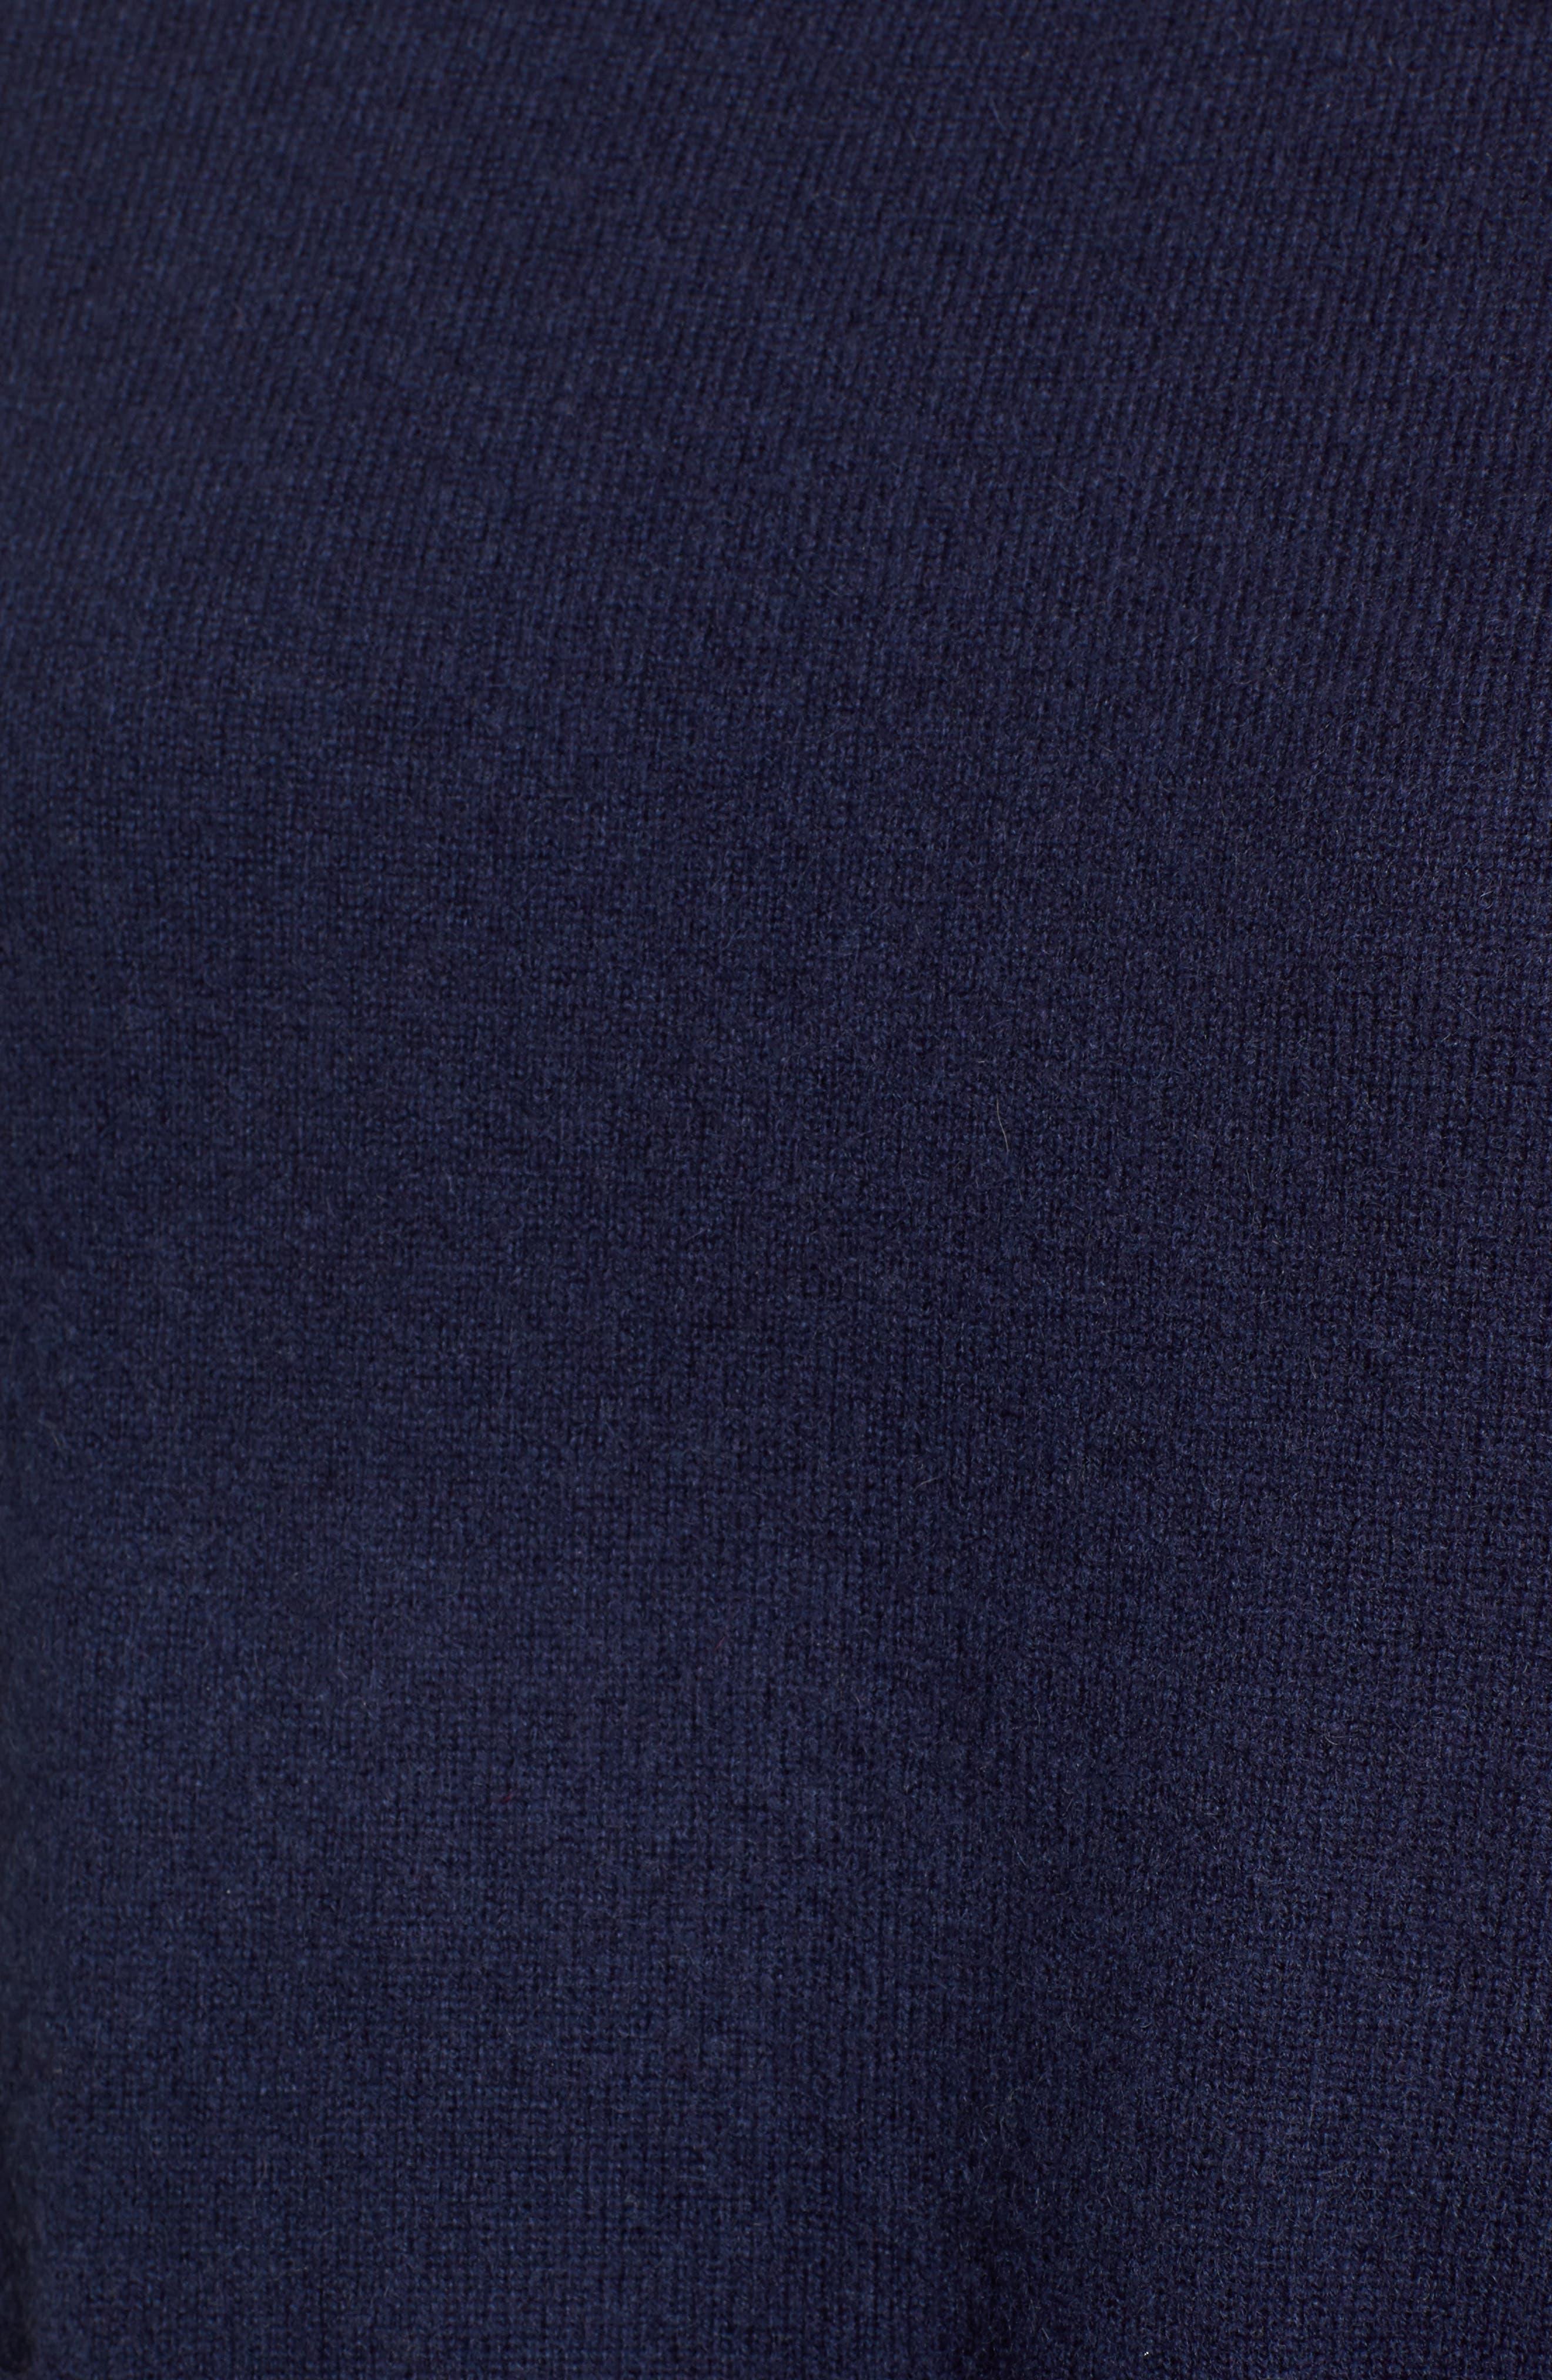 Button Detail Cashmere Sweater,                             Alternate thumbnail 10, color,